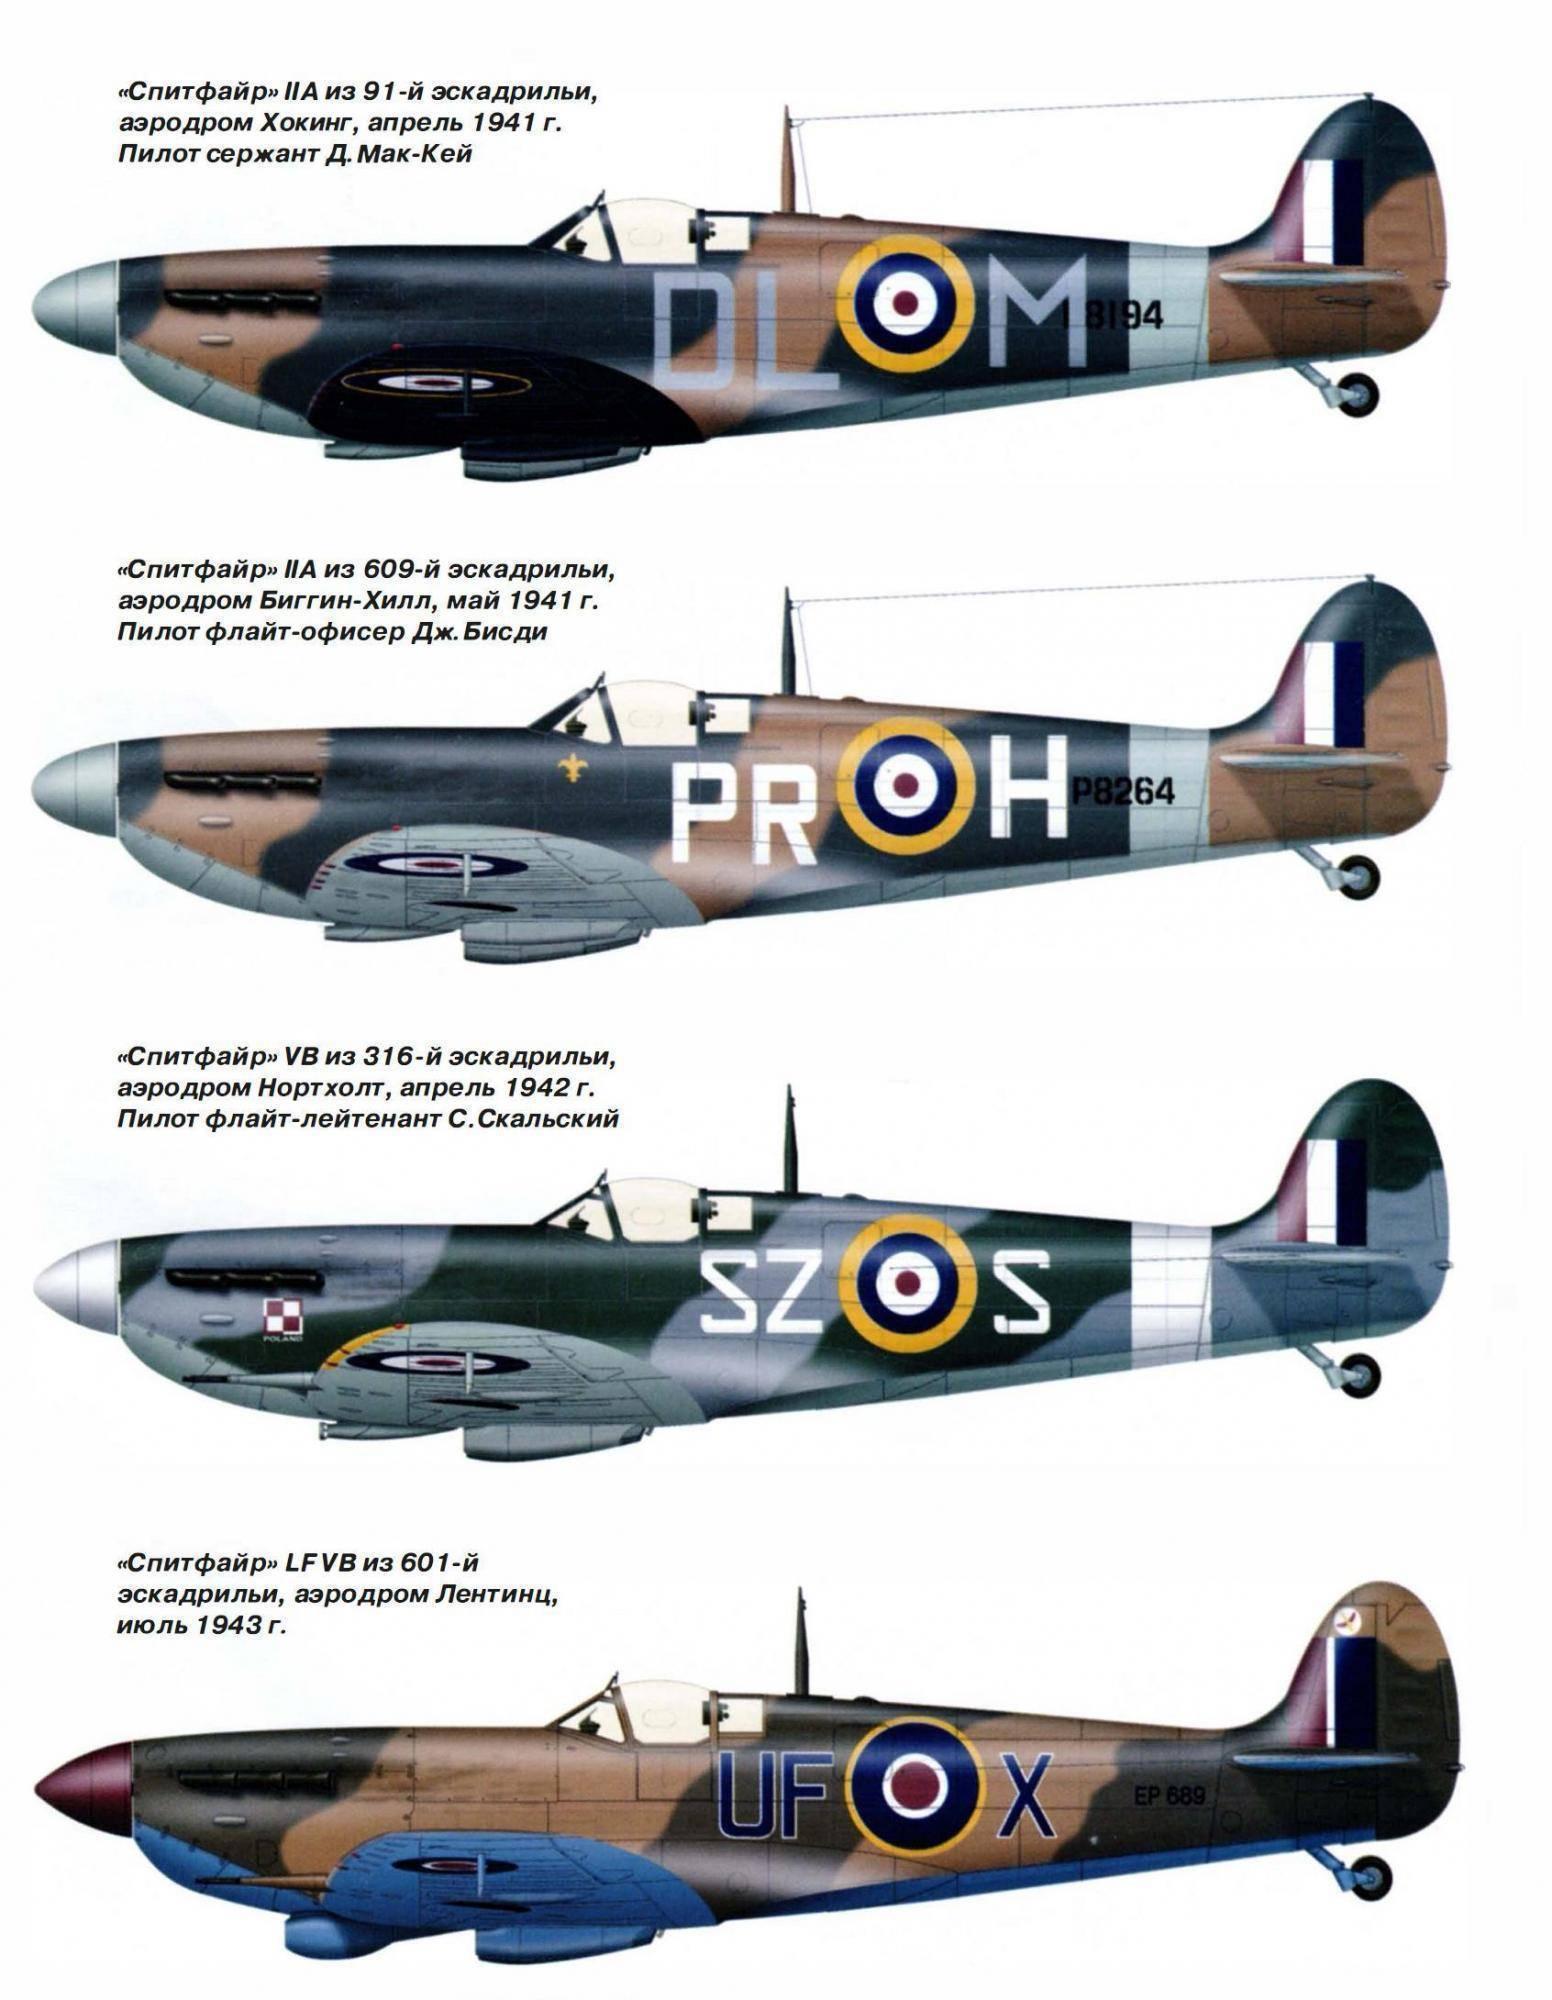 Spitfire f mk 24